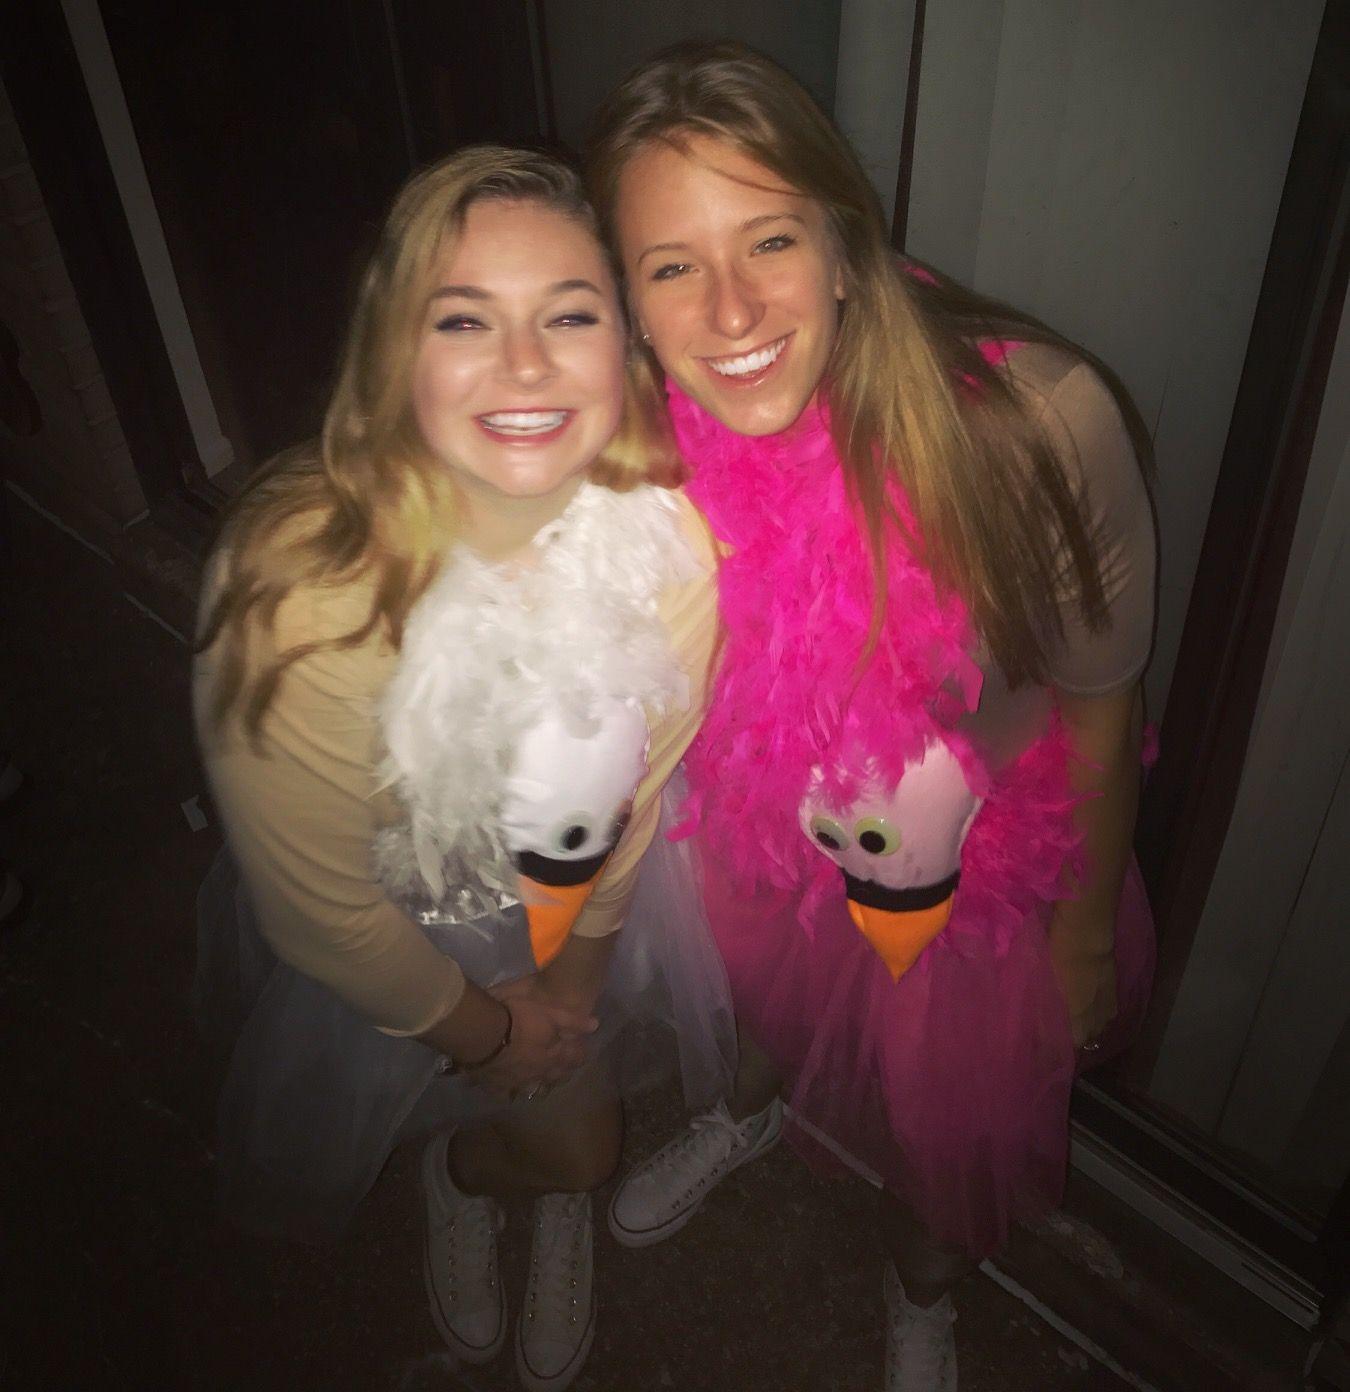 White Chicks costume Halloween costumes college, White